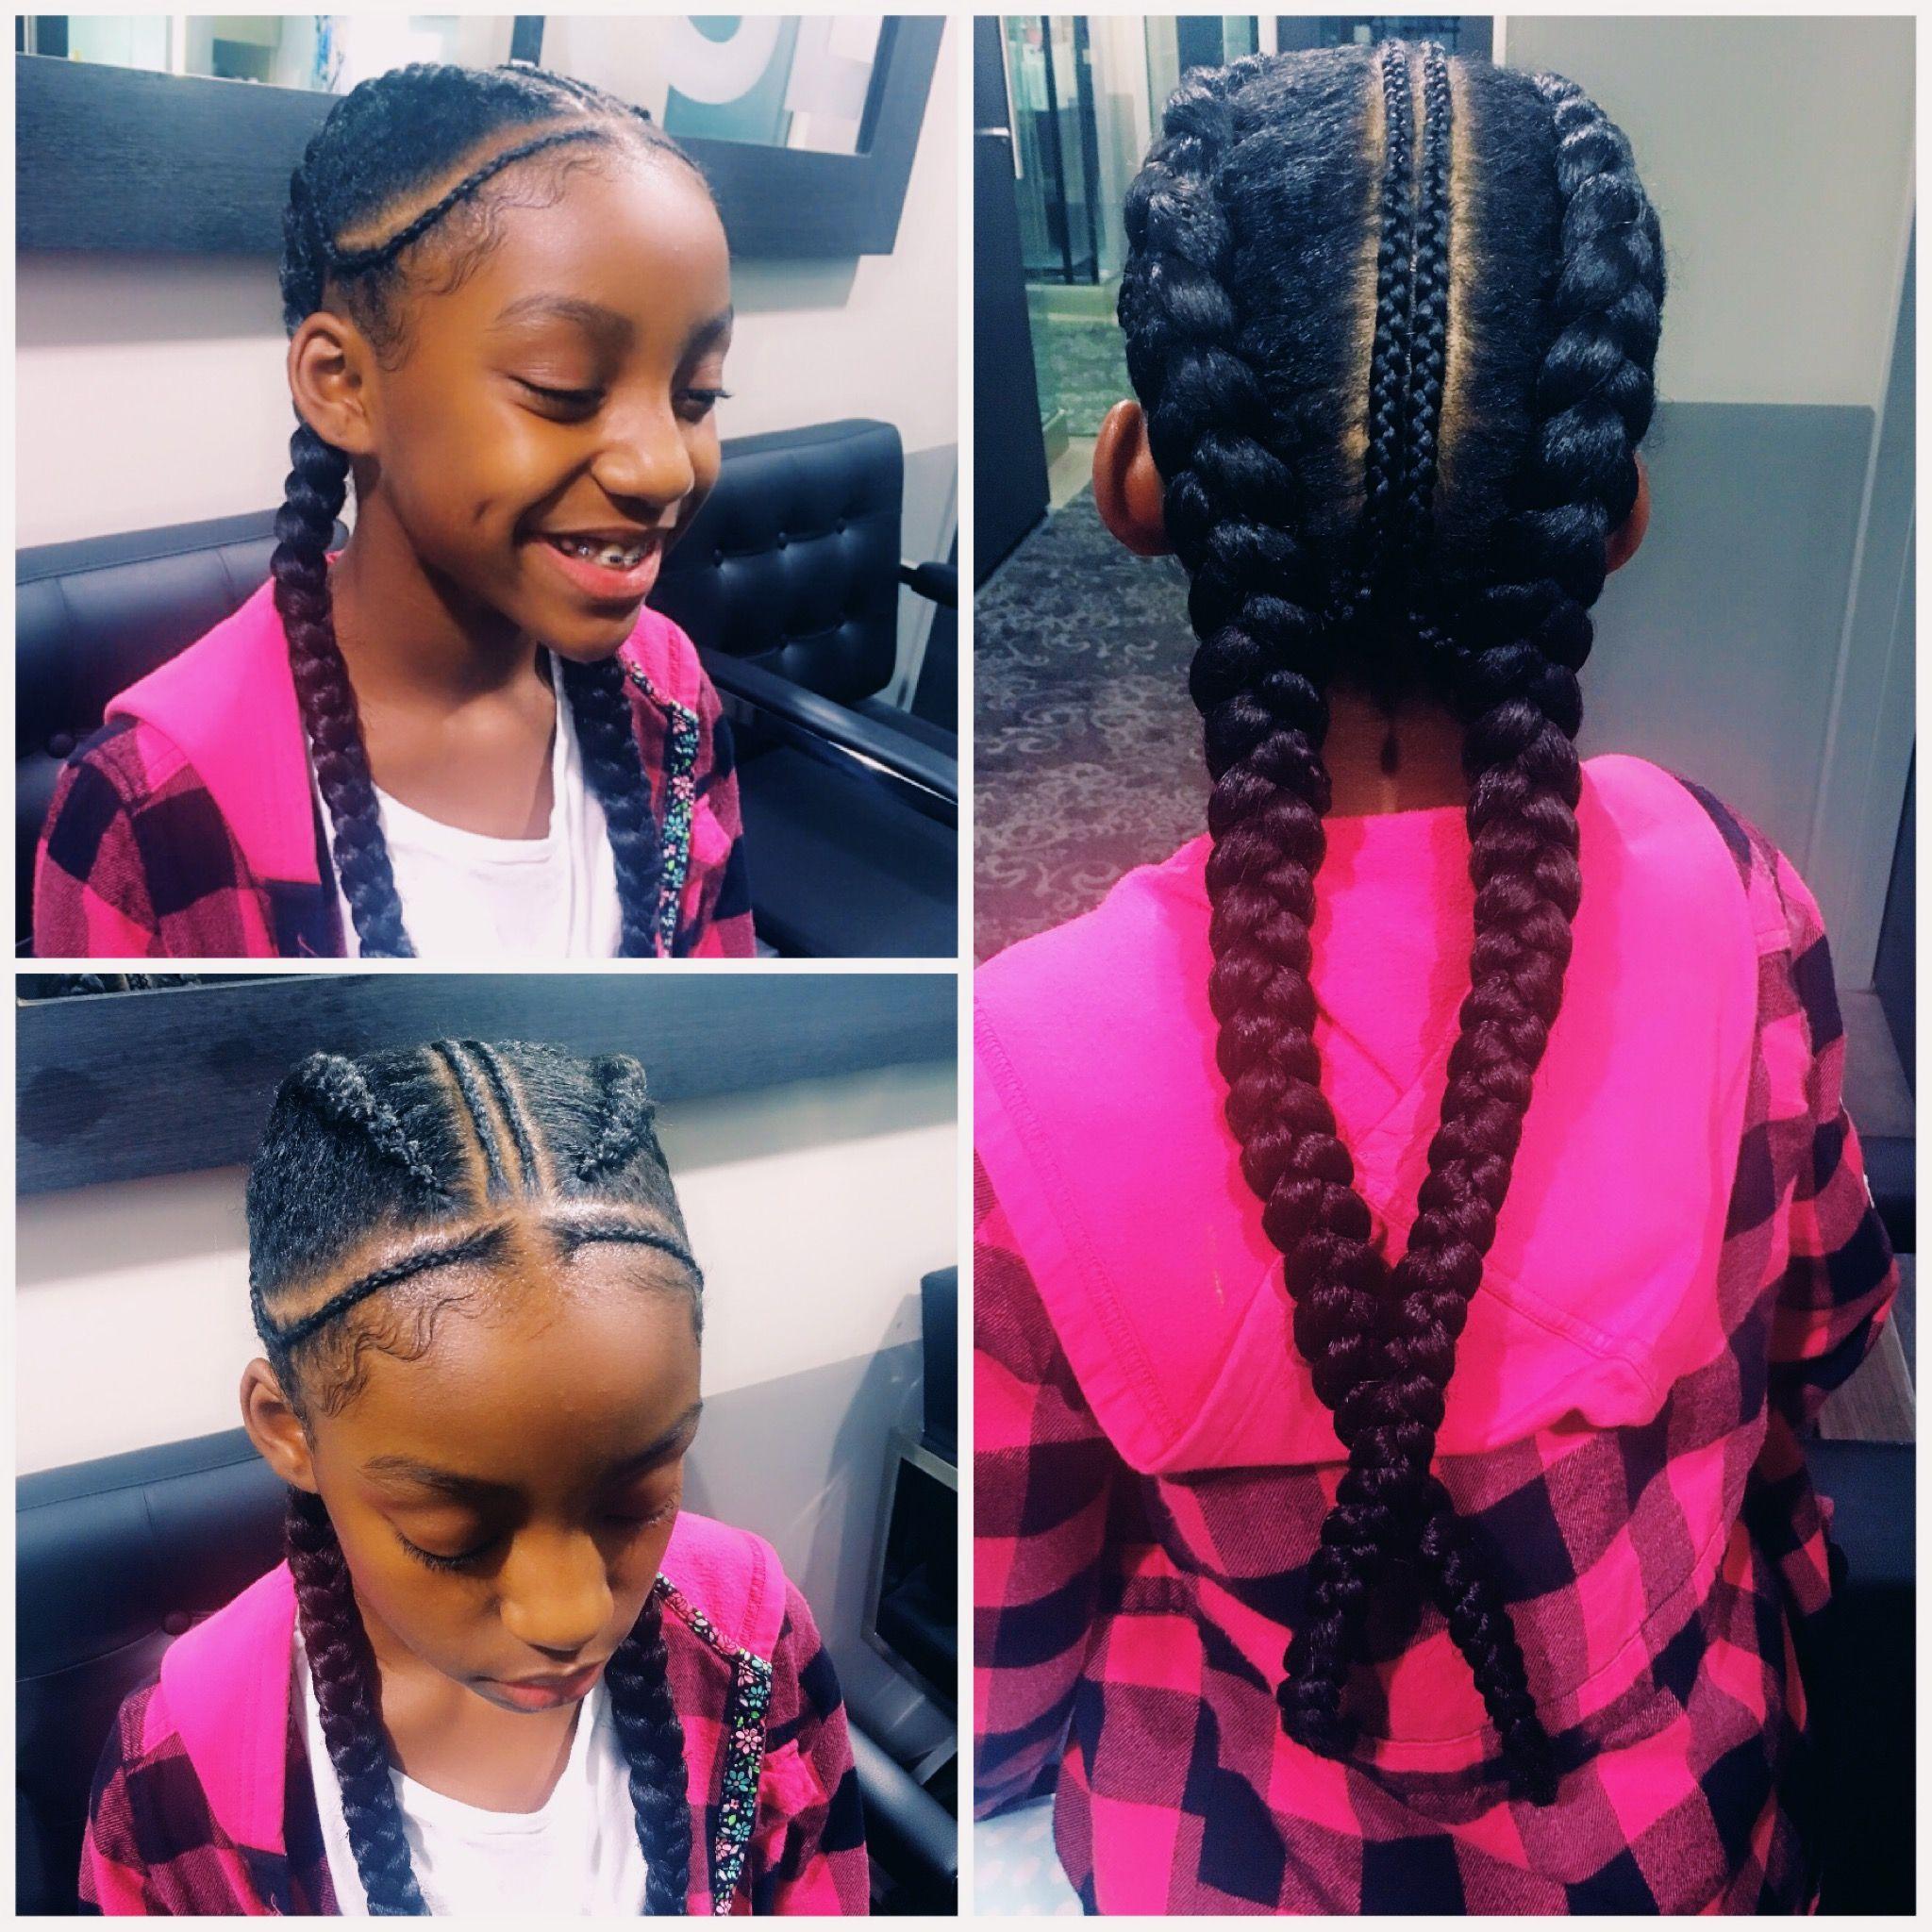 Kids Hairstyles Braids Cornrows Braided Styles Kids Hair Feeder Braids Feed Braids Kids Hairstyles Hair Styles Braid Styles